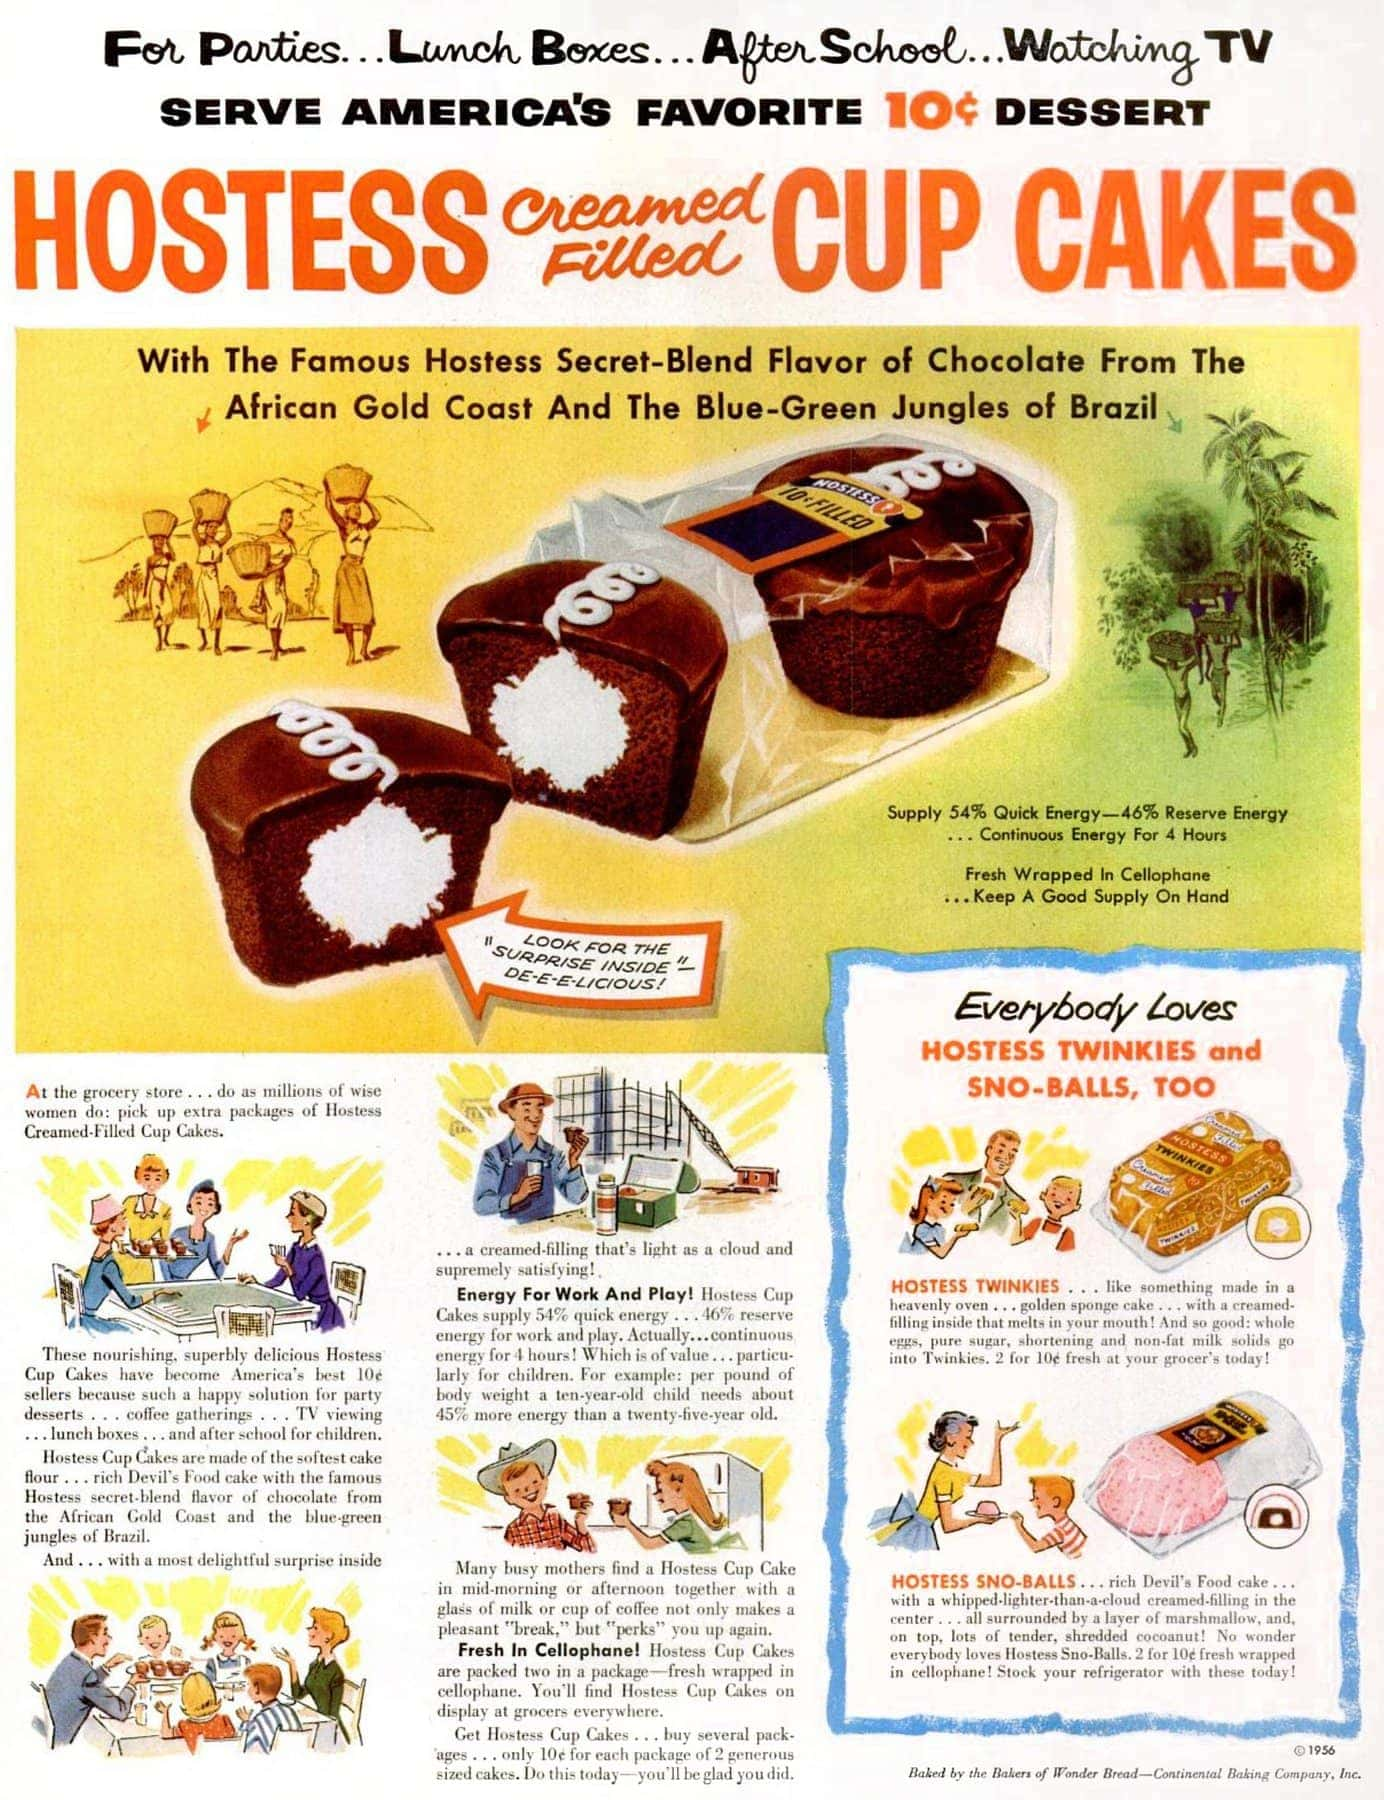 Jun 11, 1956 Hostess Ho Hos chocolate cupcakes - food